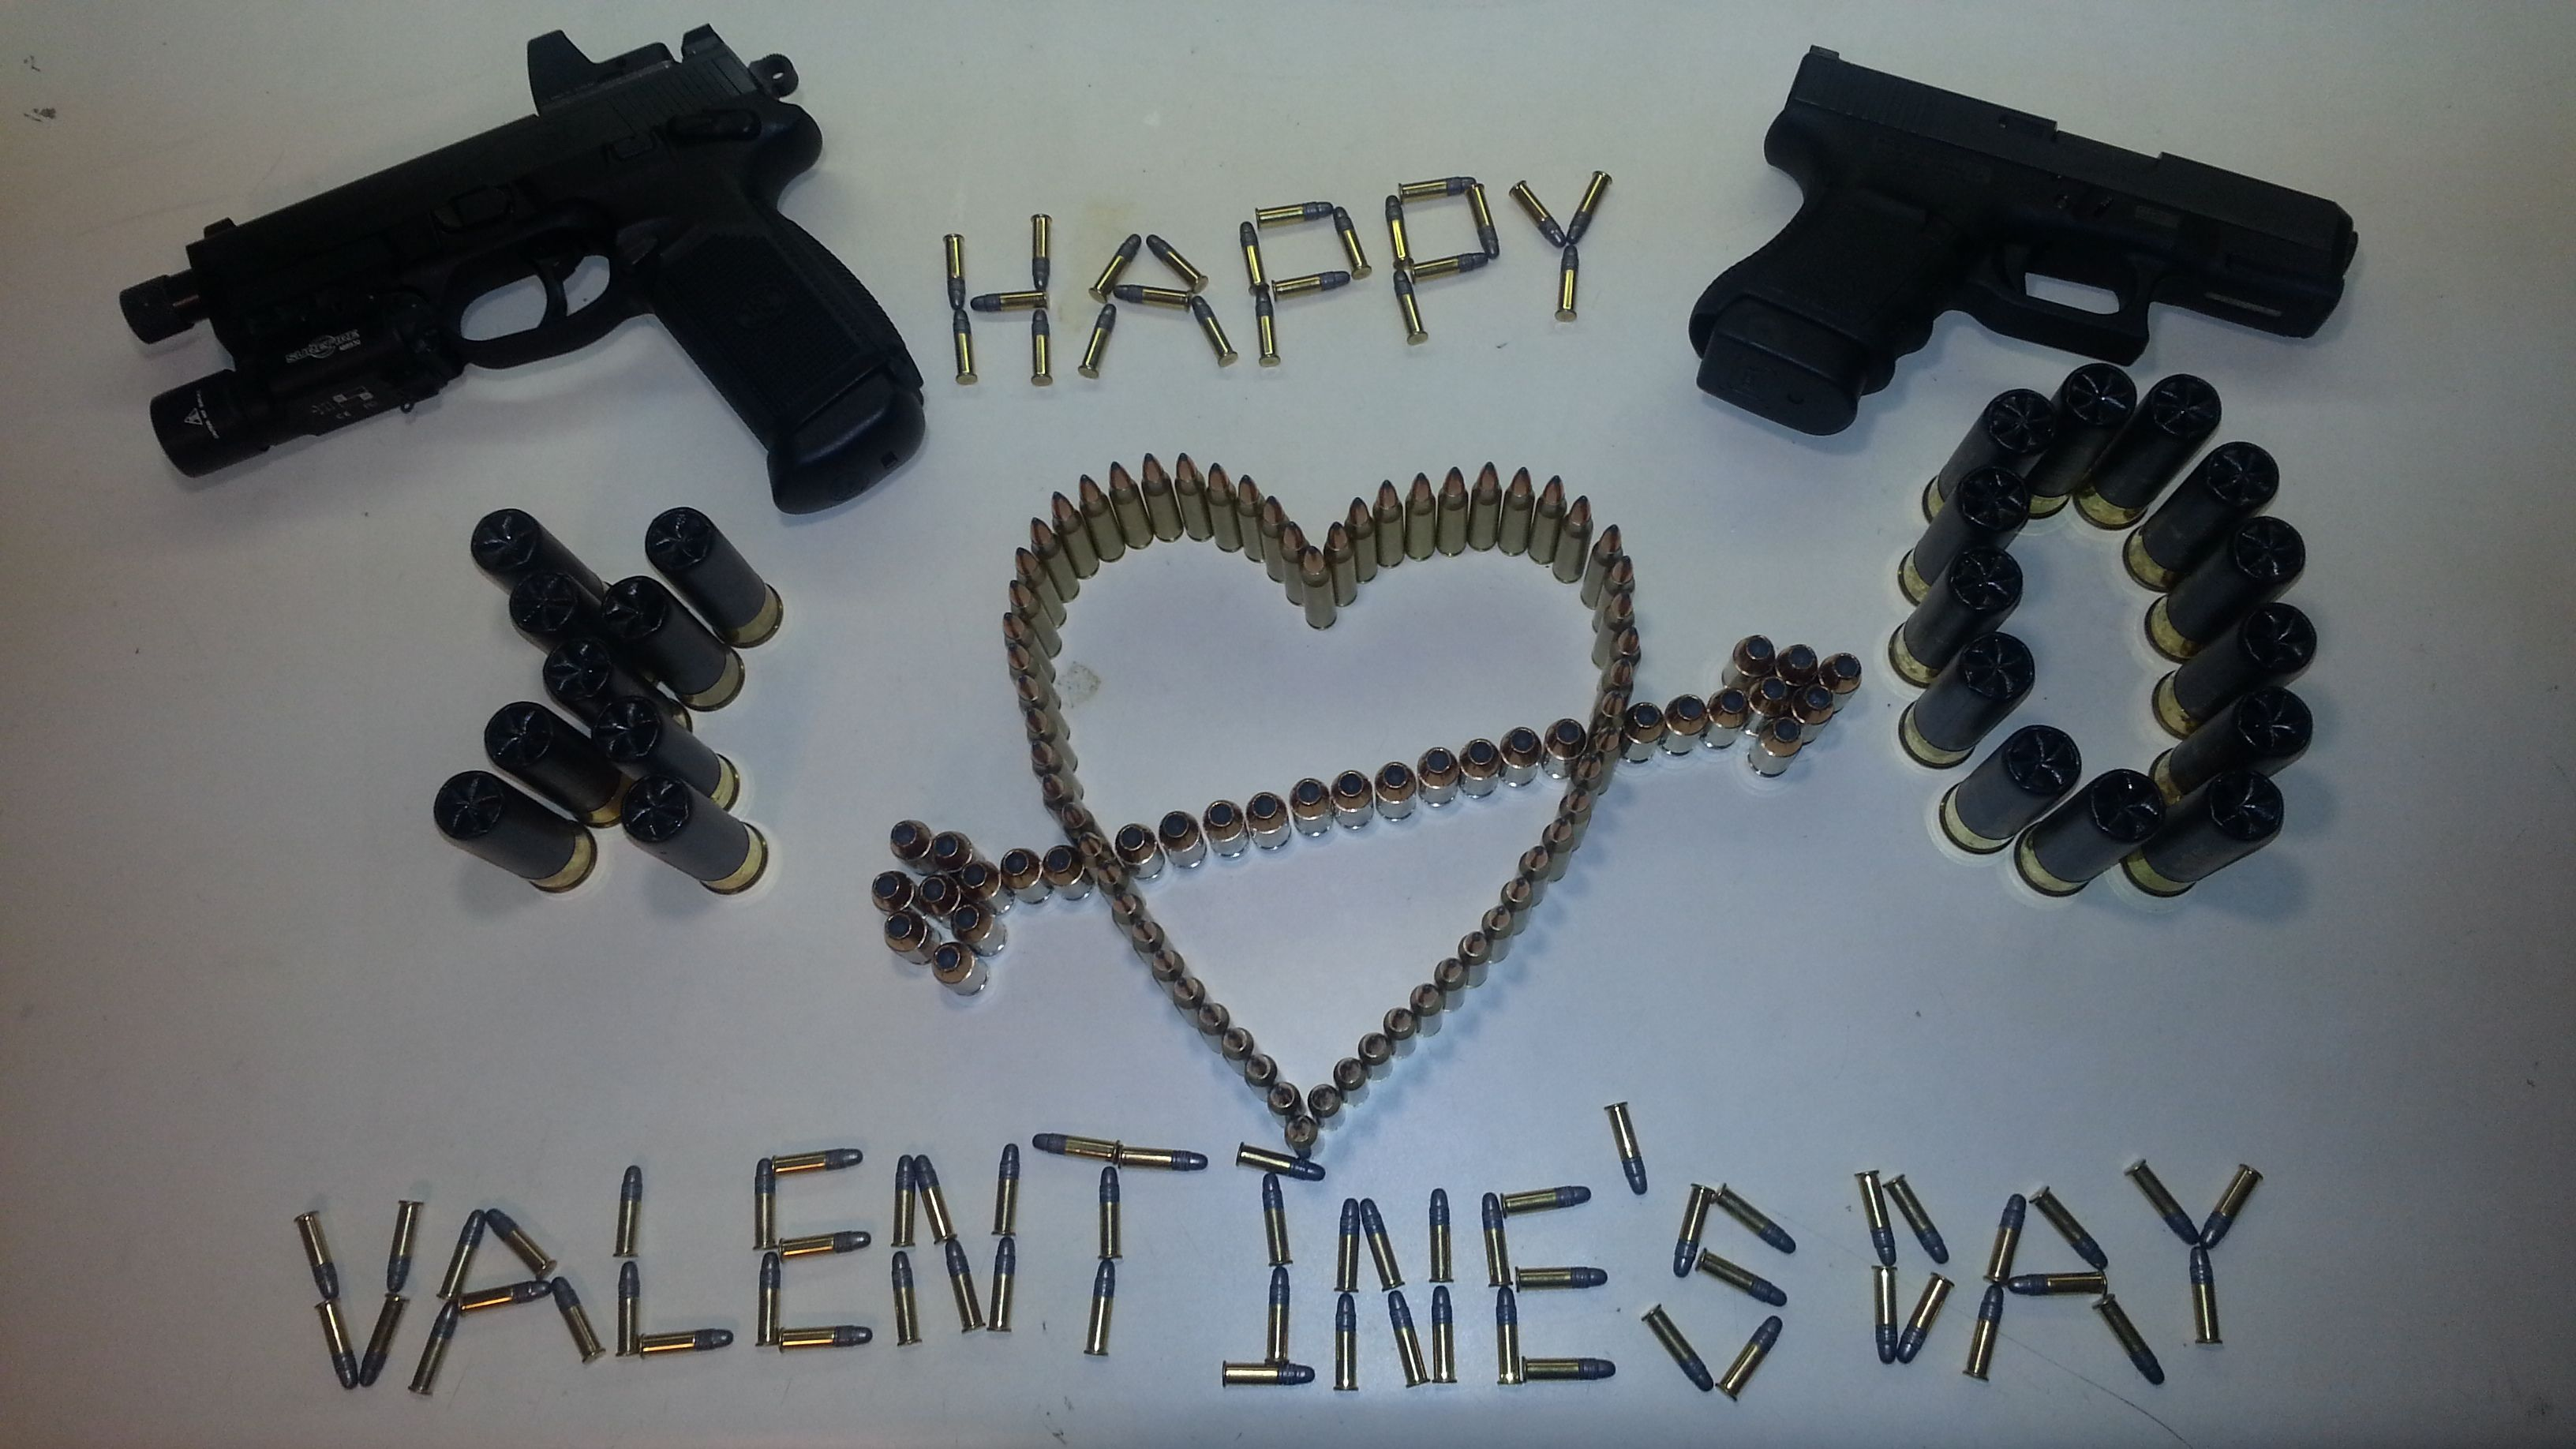 Pin By Brian On Valentine S Day Funny Jokes Jokes Trending Memes